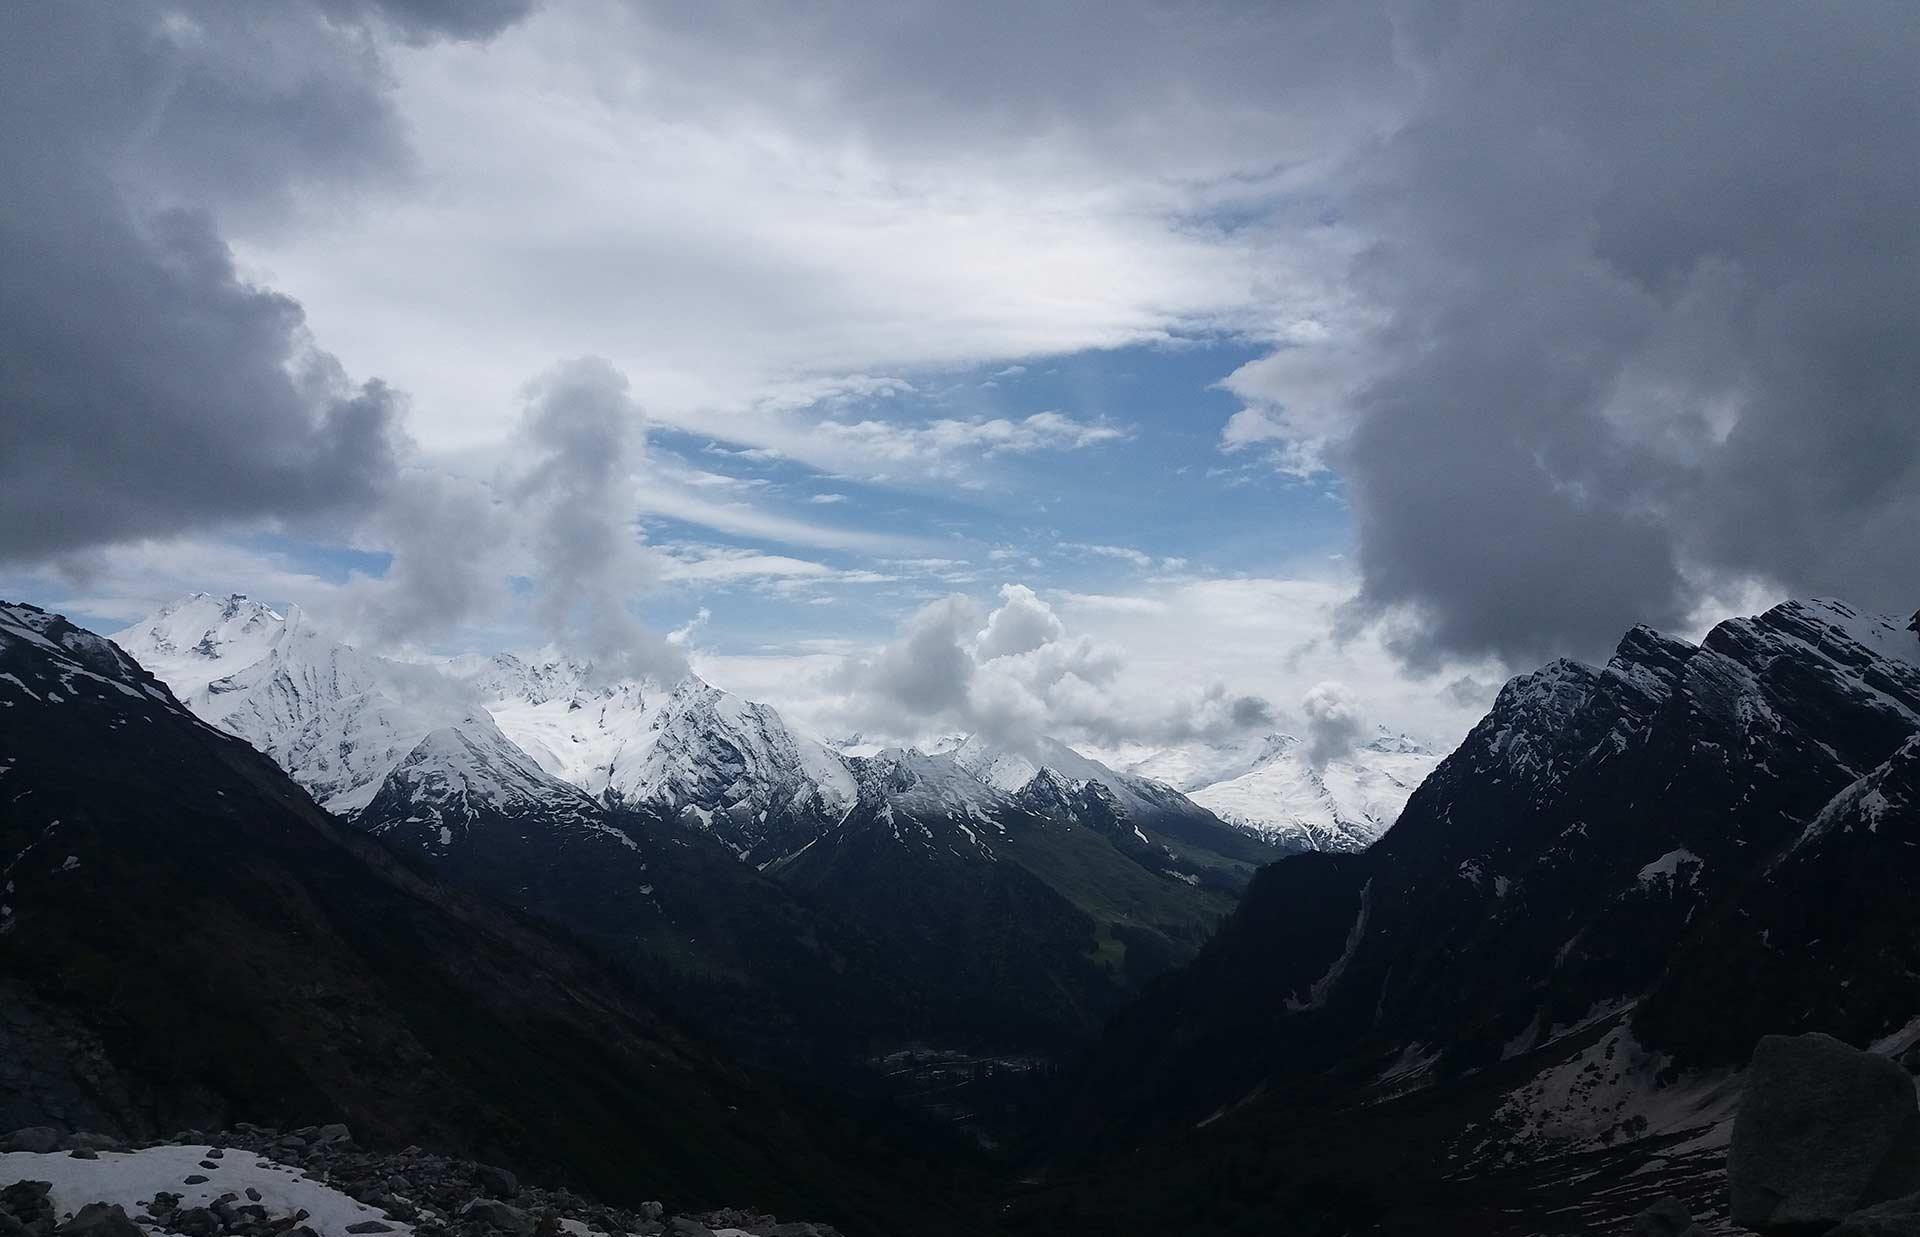 http://www.thegreatnext.com/Beas Kund Trek Himachal Pradesh Manali Himalayas Trekking Adventure The Great Next Fun